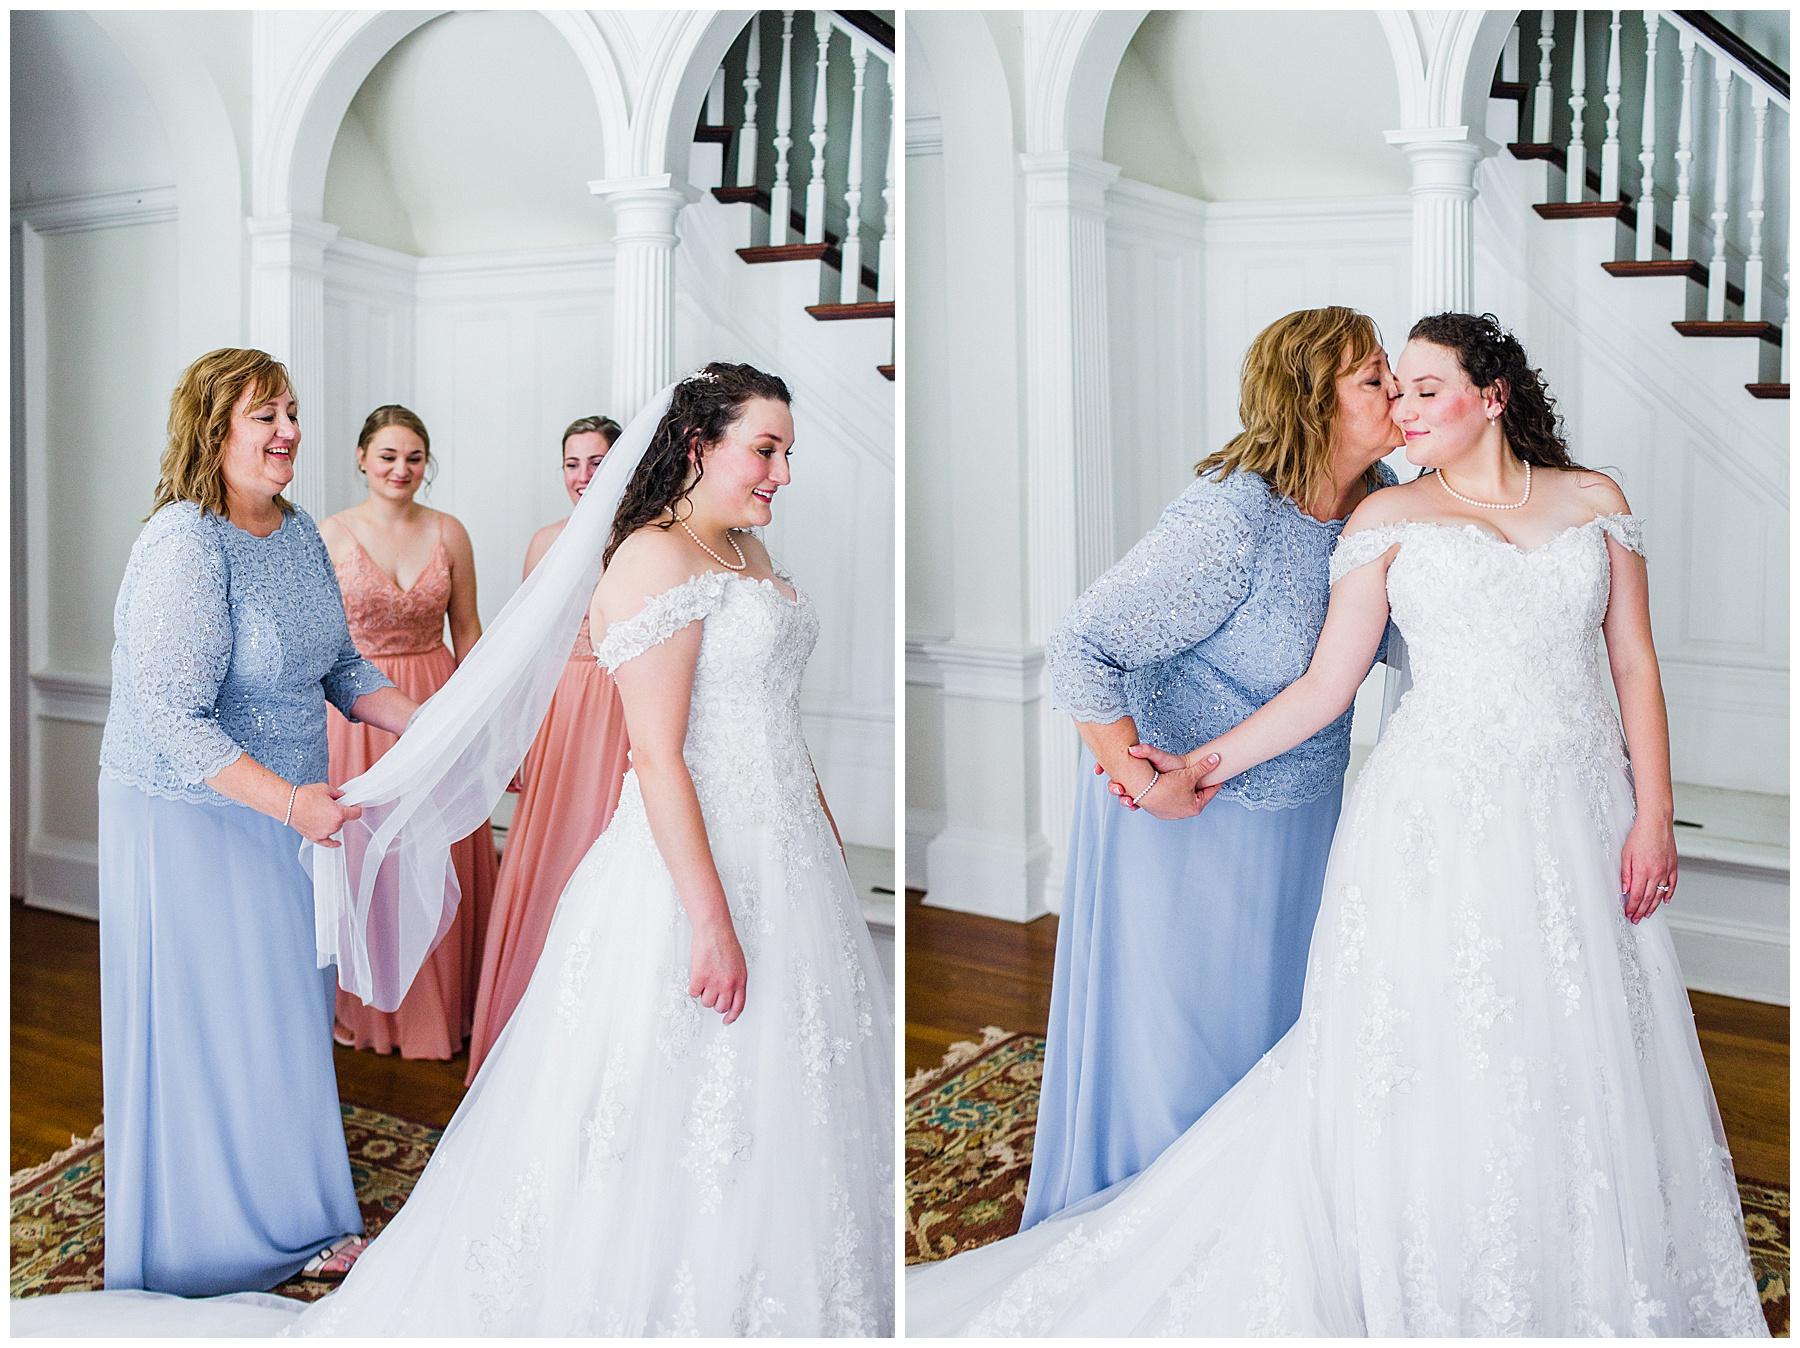 oak-ridge-estate-wedding-virginia-photographer10.jpg